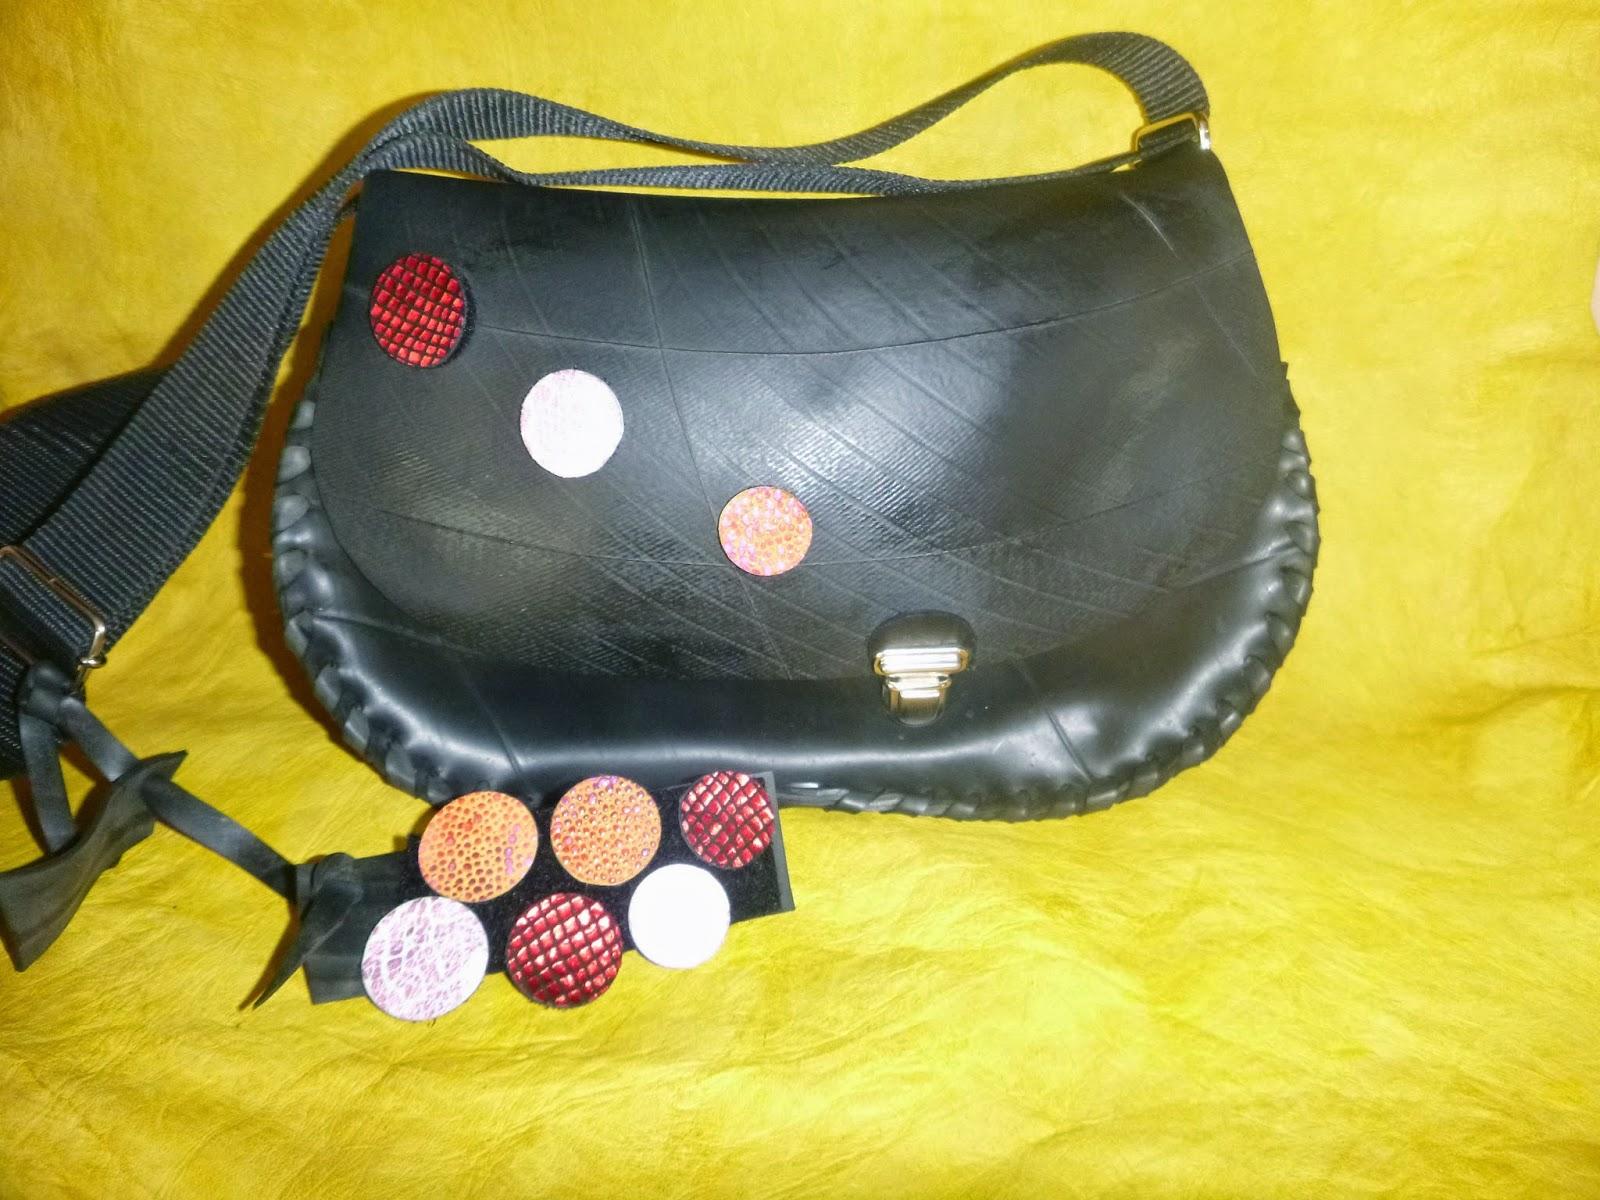 Les sacs de lucie cr ation de sacs en chambre air ou peau de pneu recycl e - Sac a main chambre a air ...